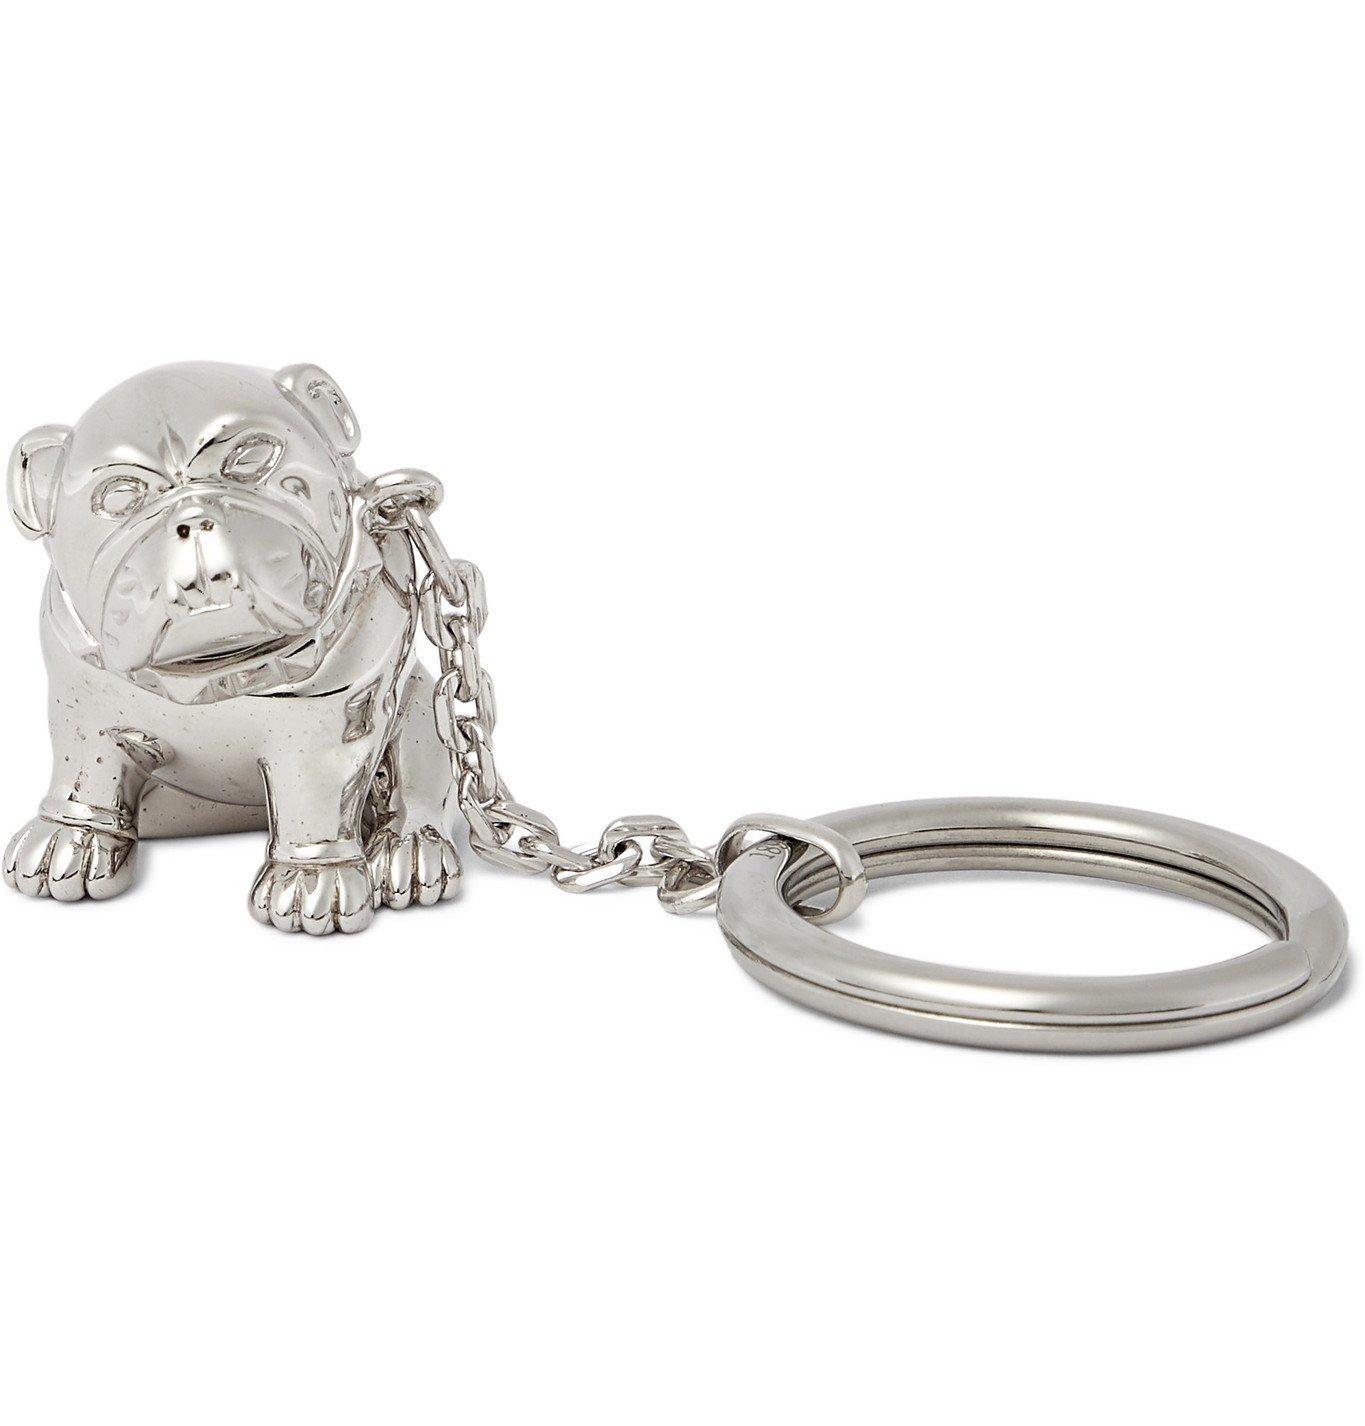 DUNHILL - Bulldog Palladium-Plated Key Fob - Silver